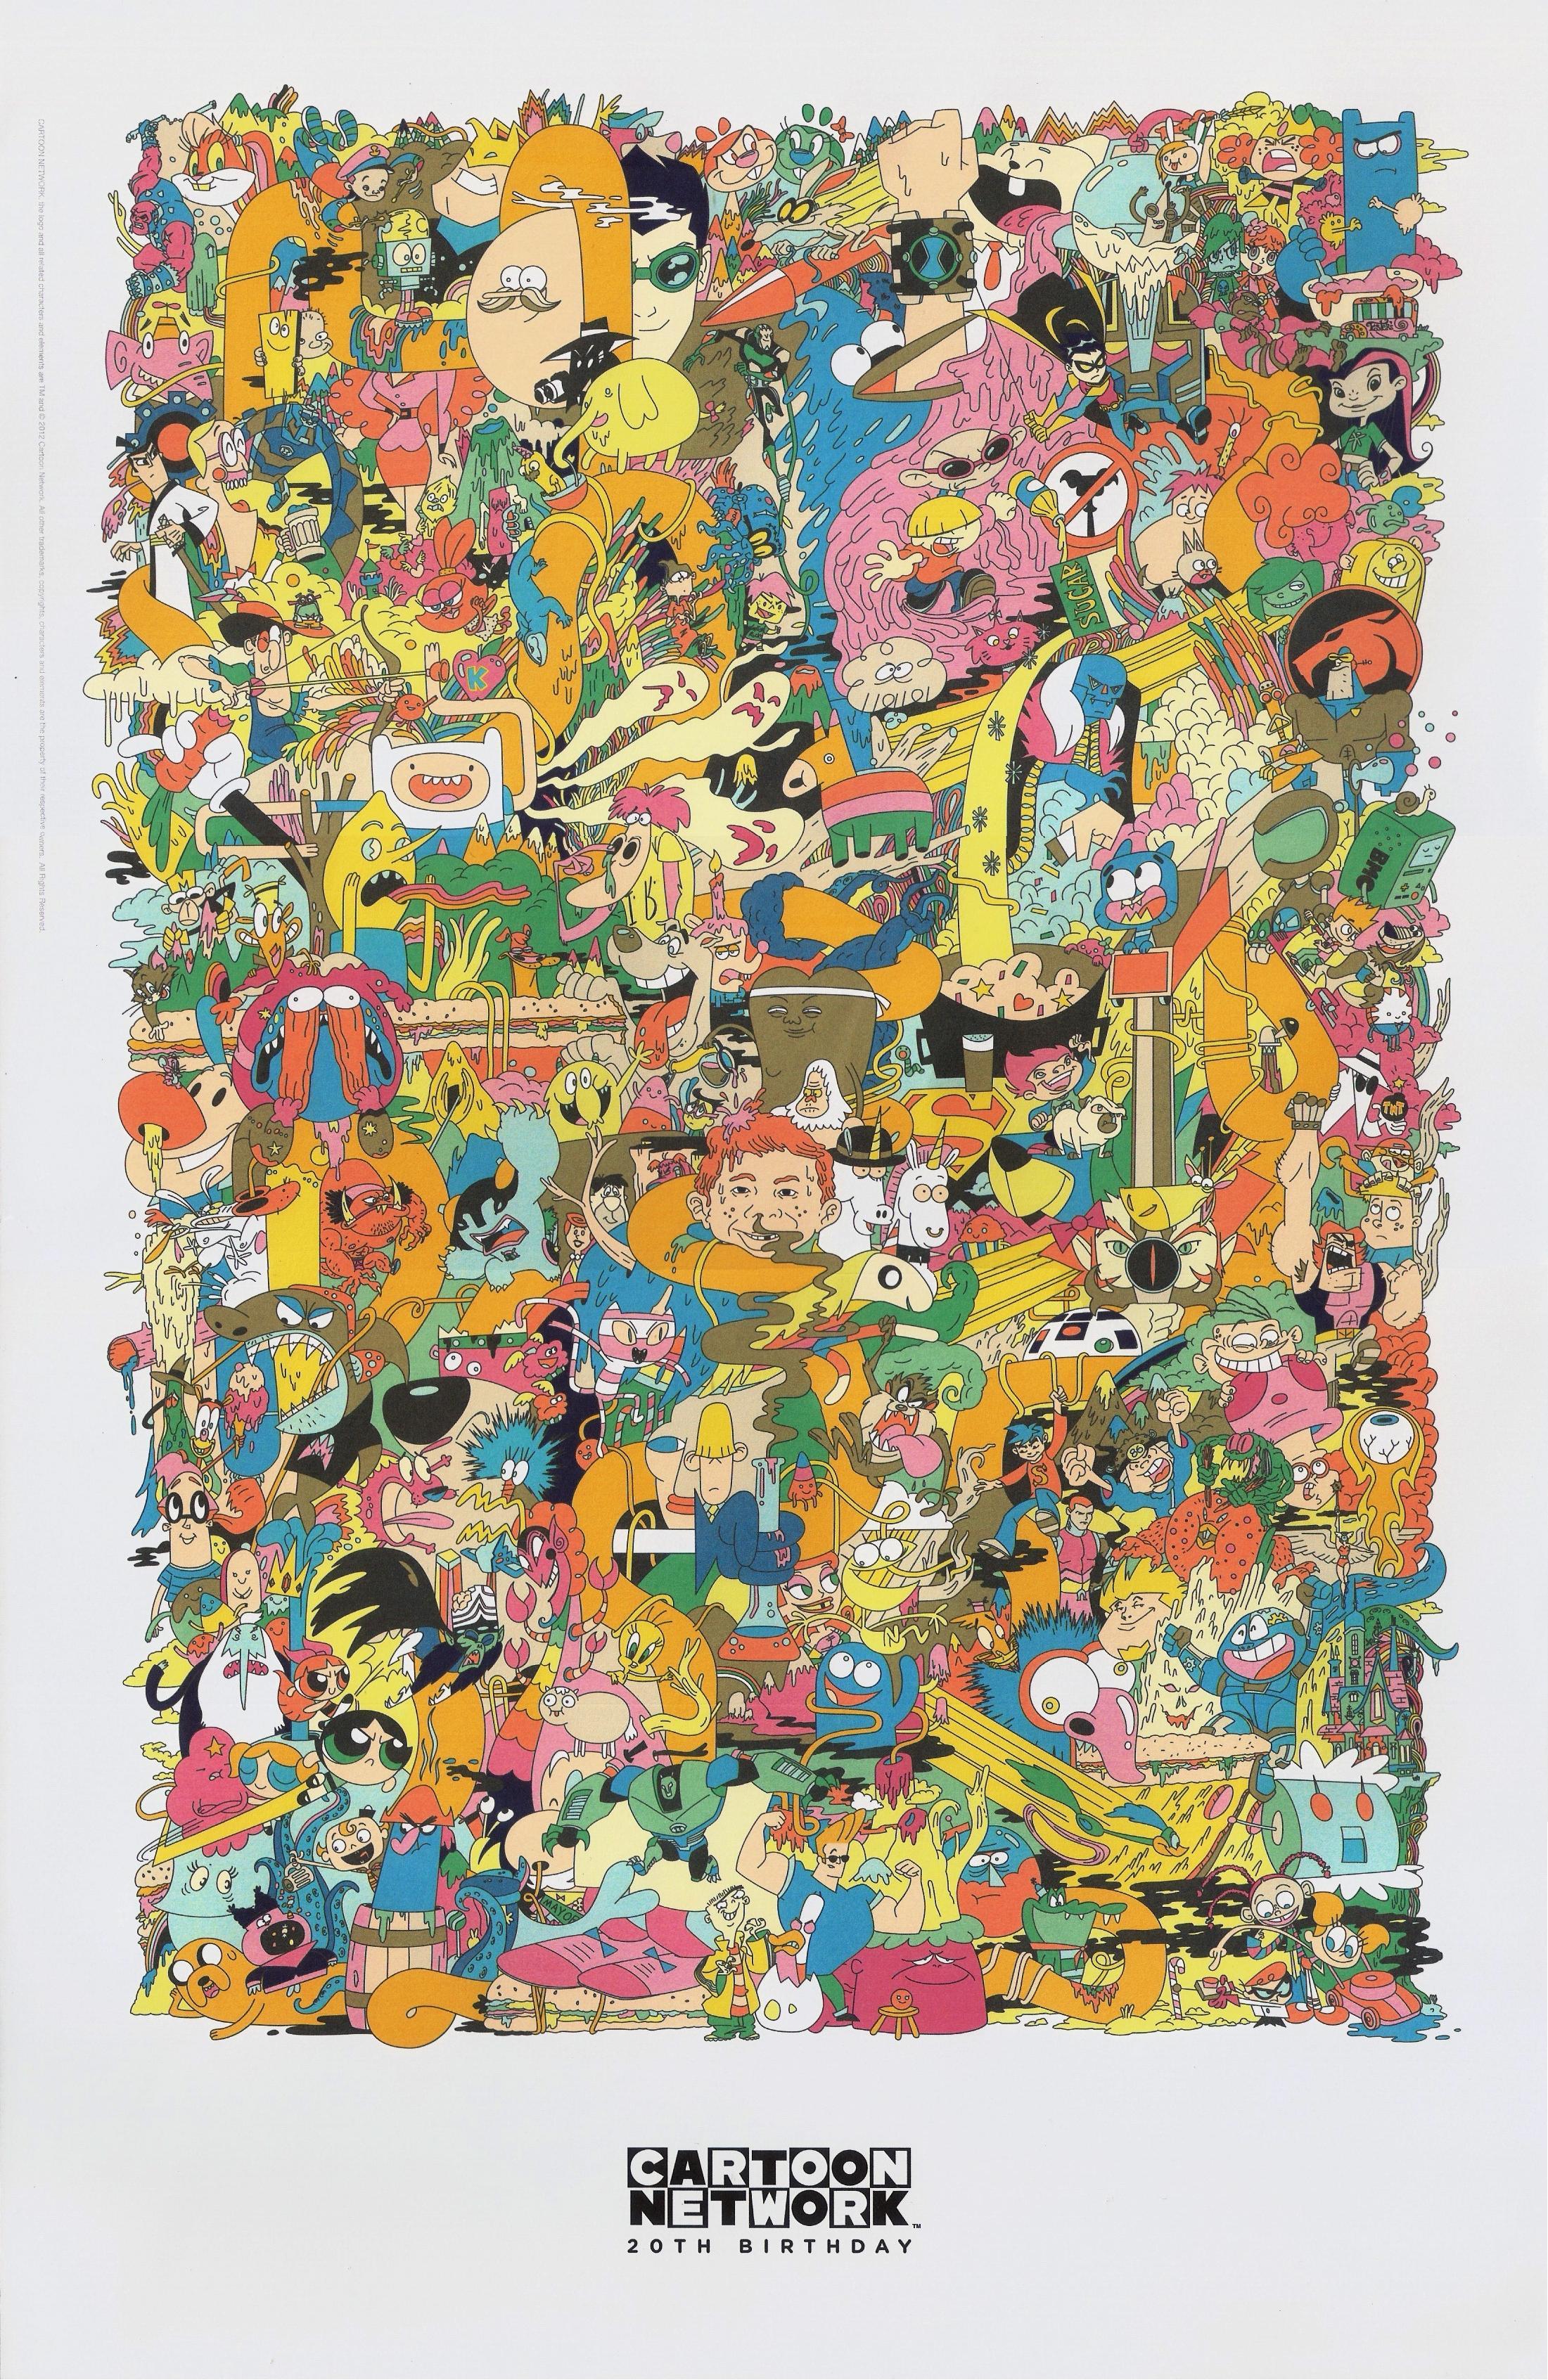 Cartoon Network 20th Anniversary